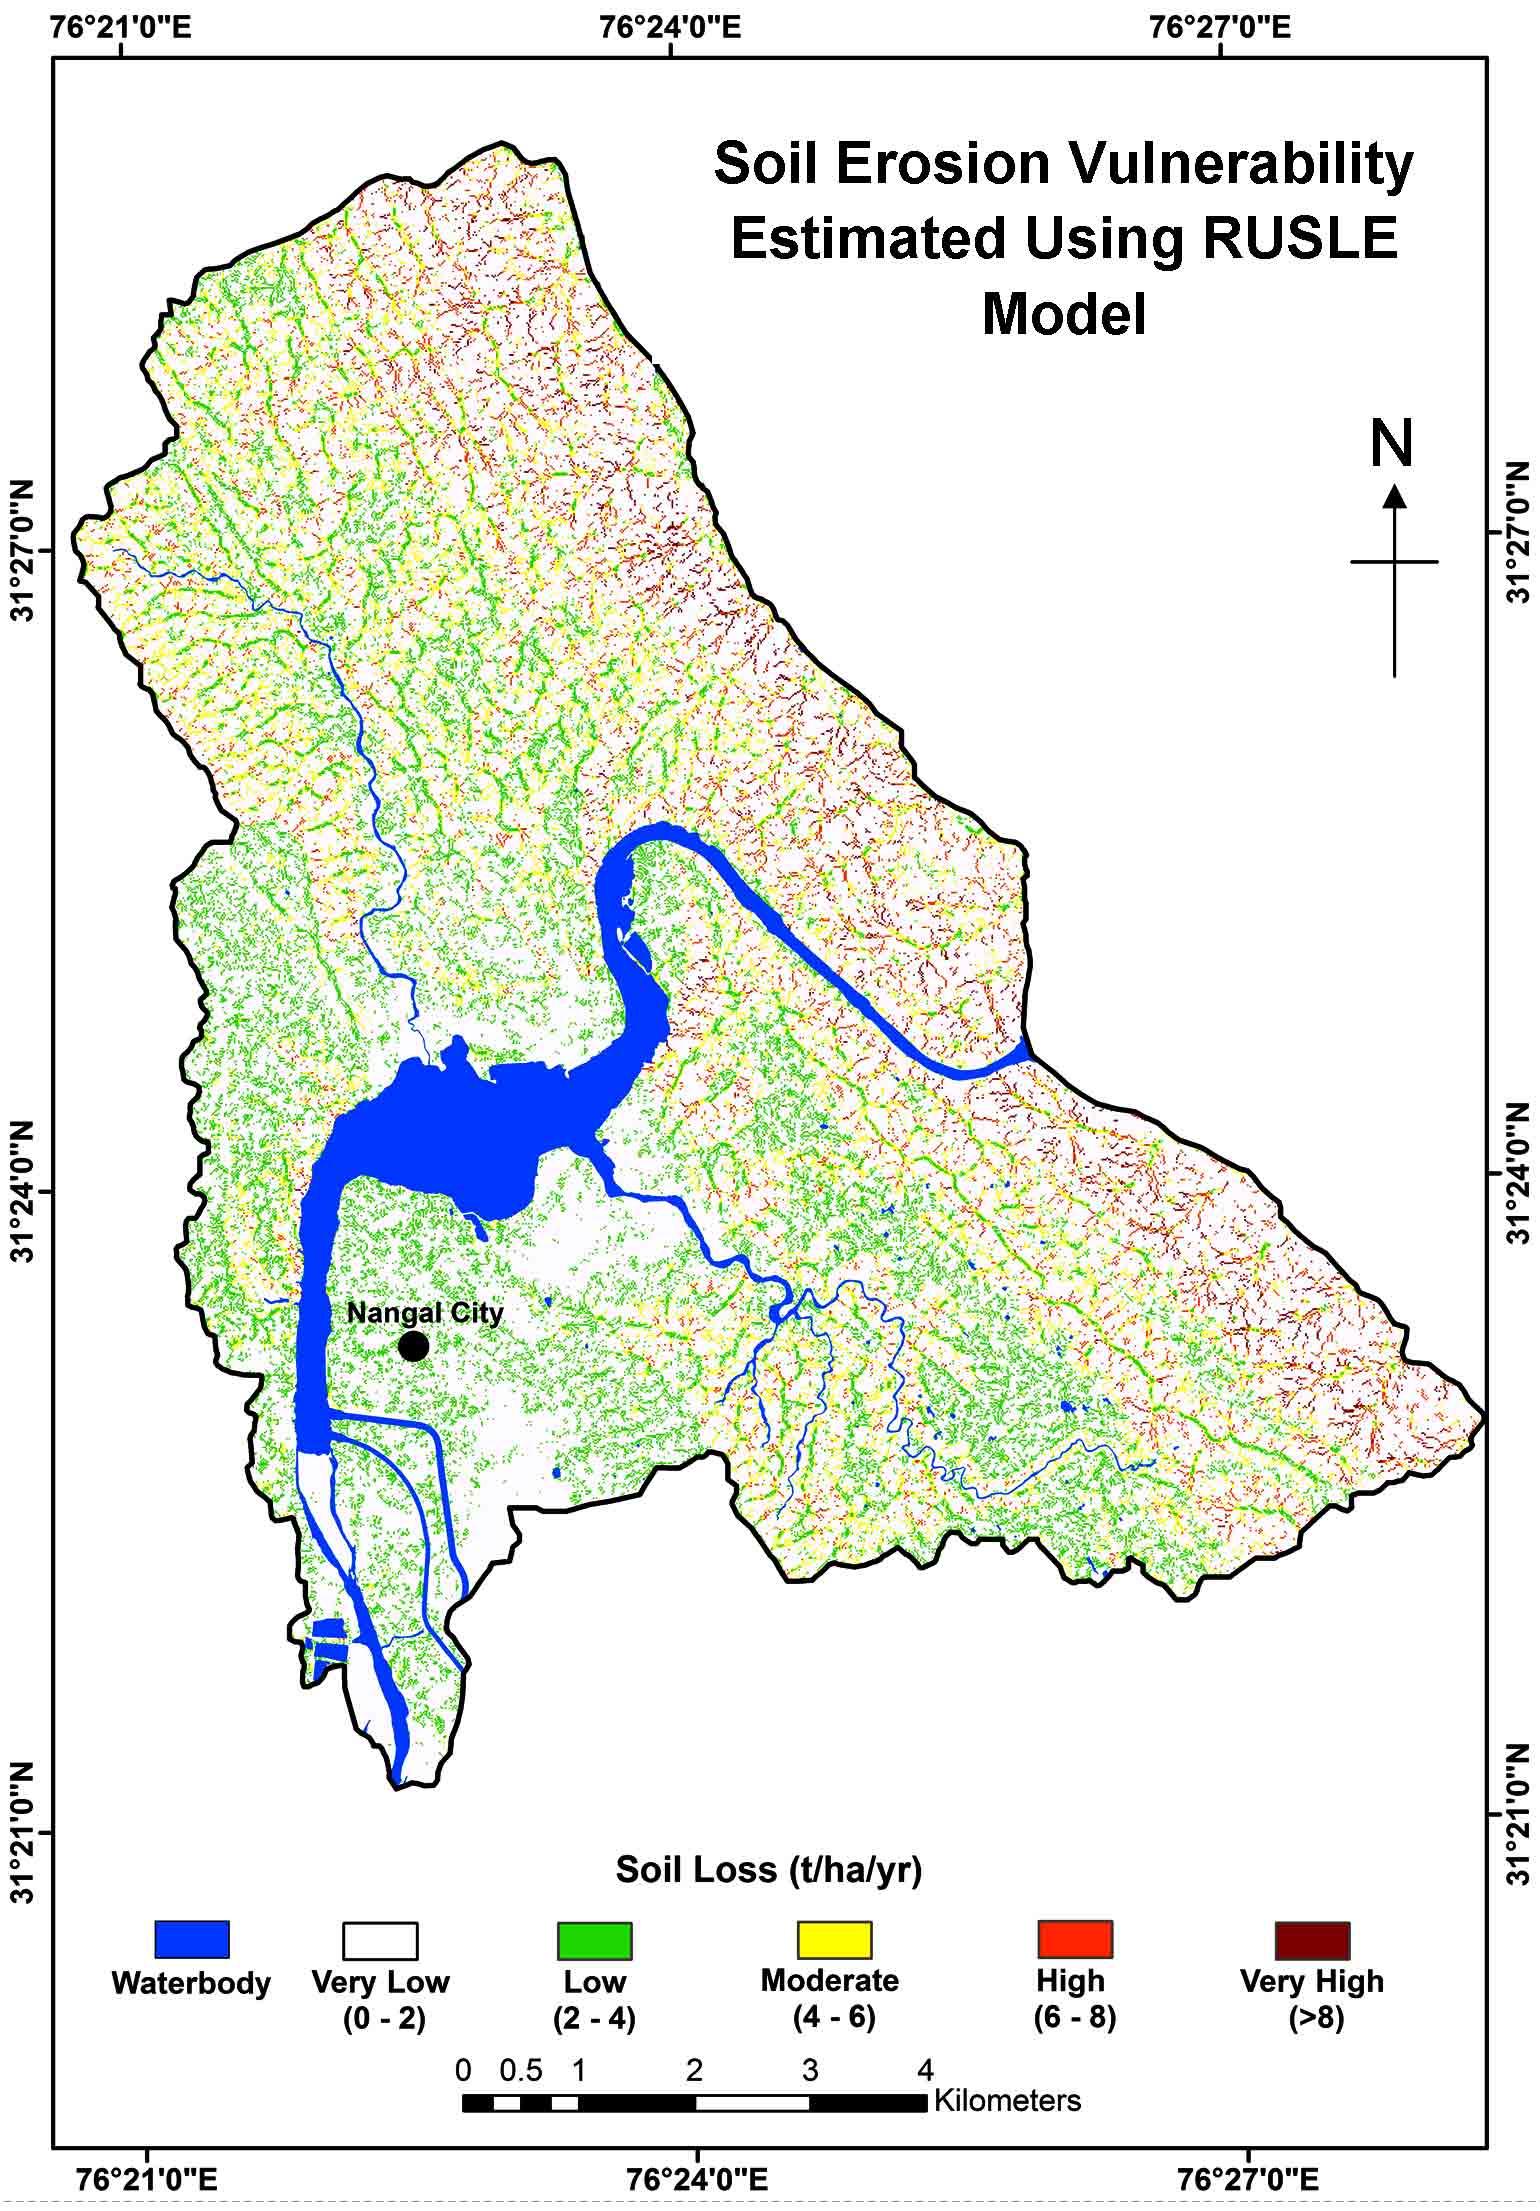 Modeling Soil Erosion Vulnerability Using RUSLE: A Case Study Upstream of Nangal Reservoir, India